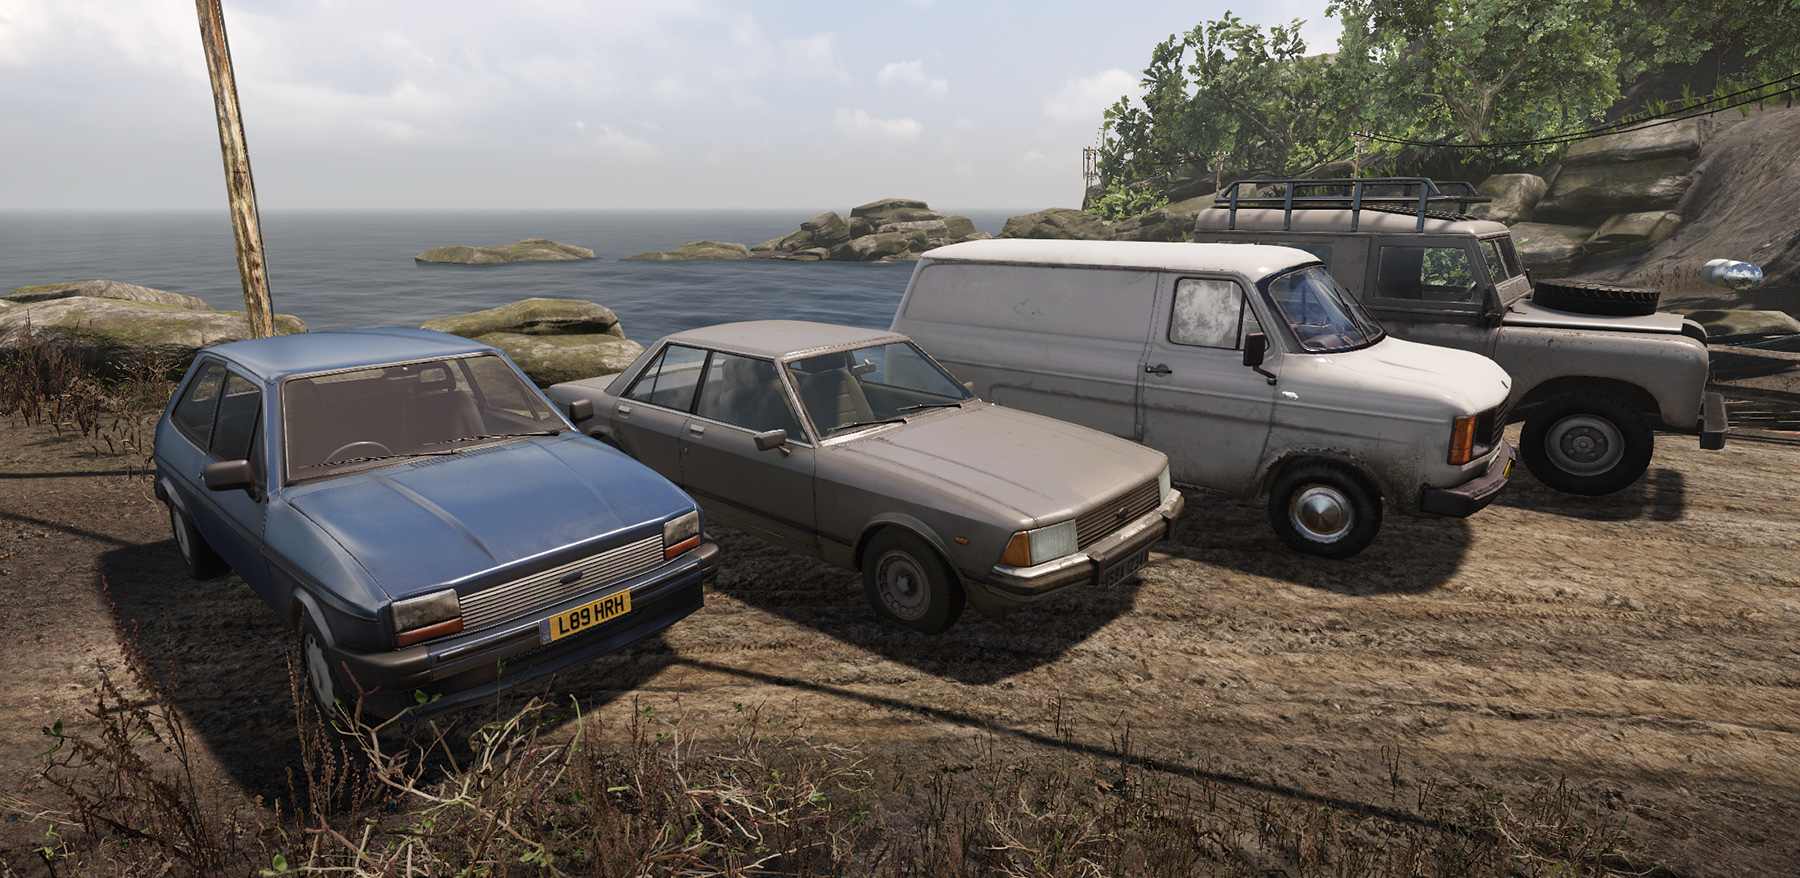 vehicles_cr.jpg